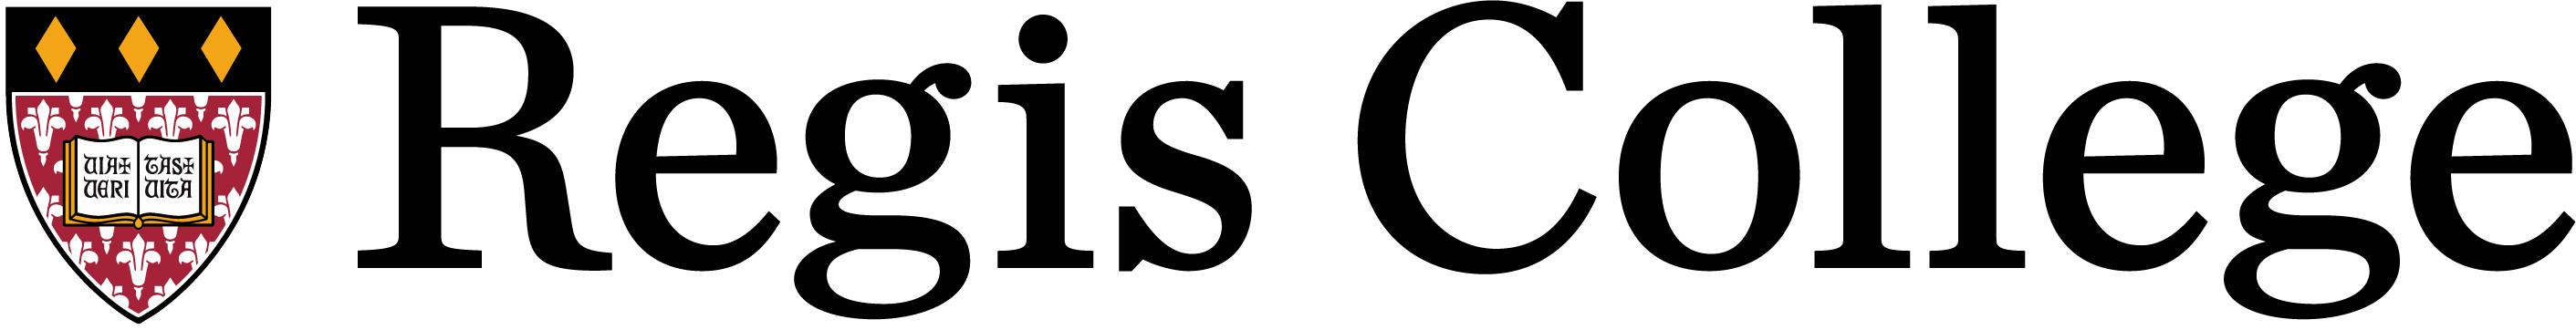 Company Logo REGIS COLLEGE